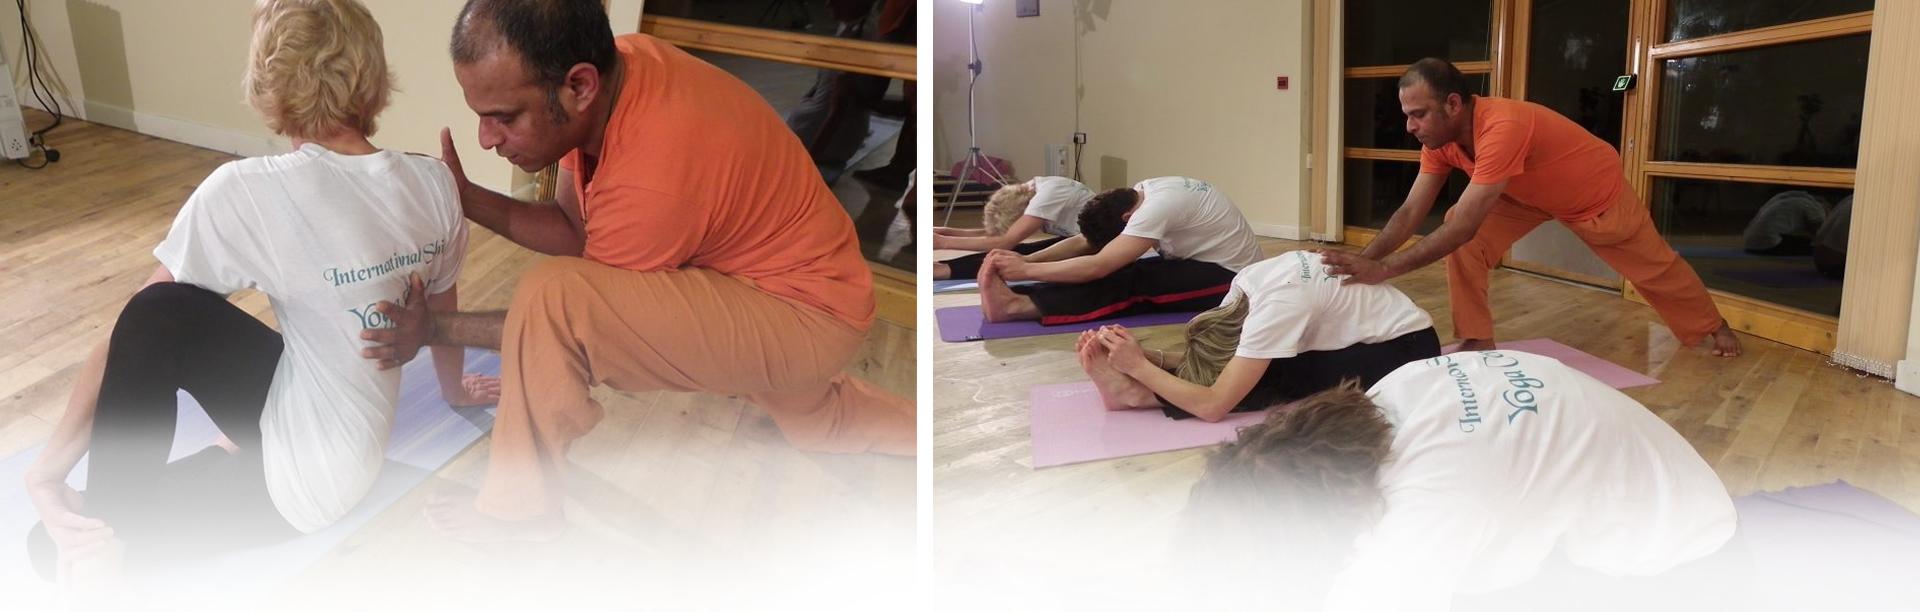 liverpool yoga teacher training yoga teacher training. Black Bedroom Furniture Sets. Home Design Ideas